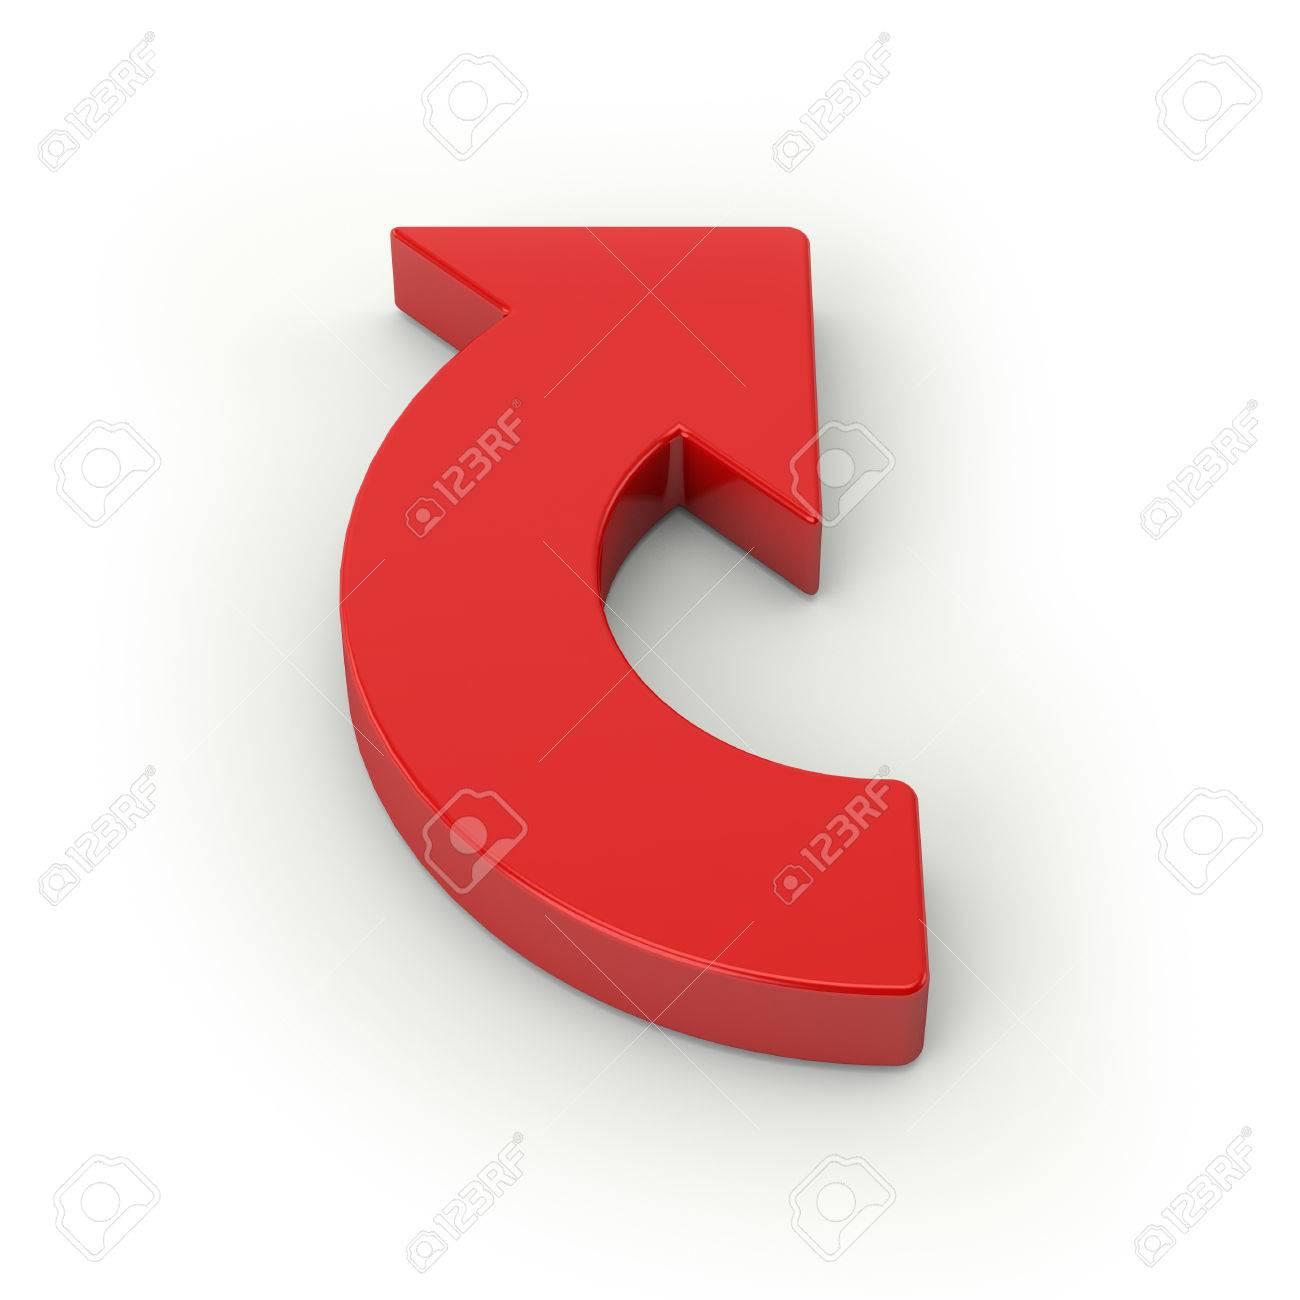 Big red arrow on white background Stock Photo - 28469041